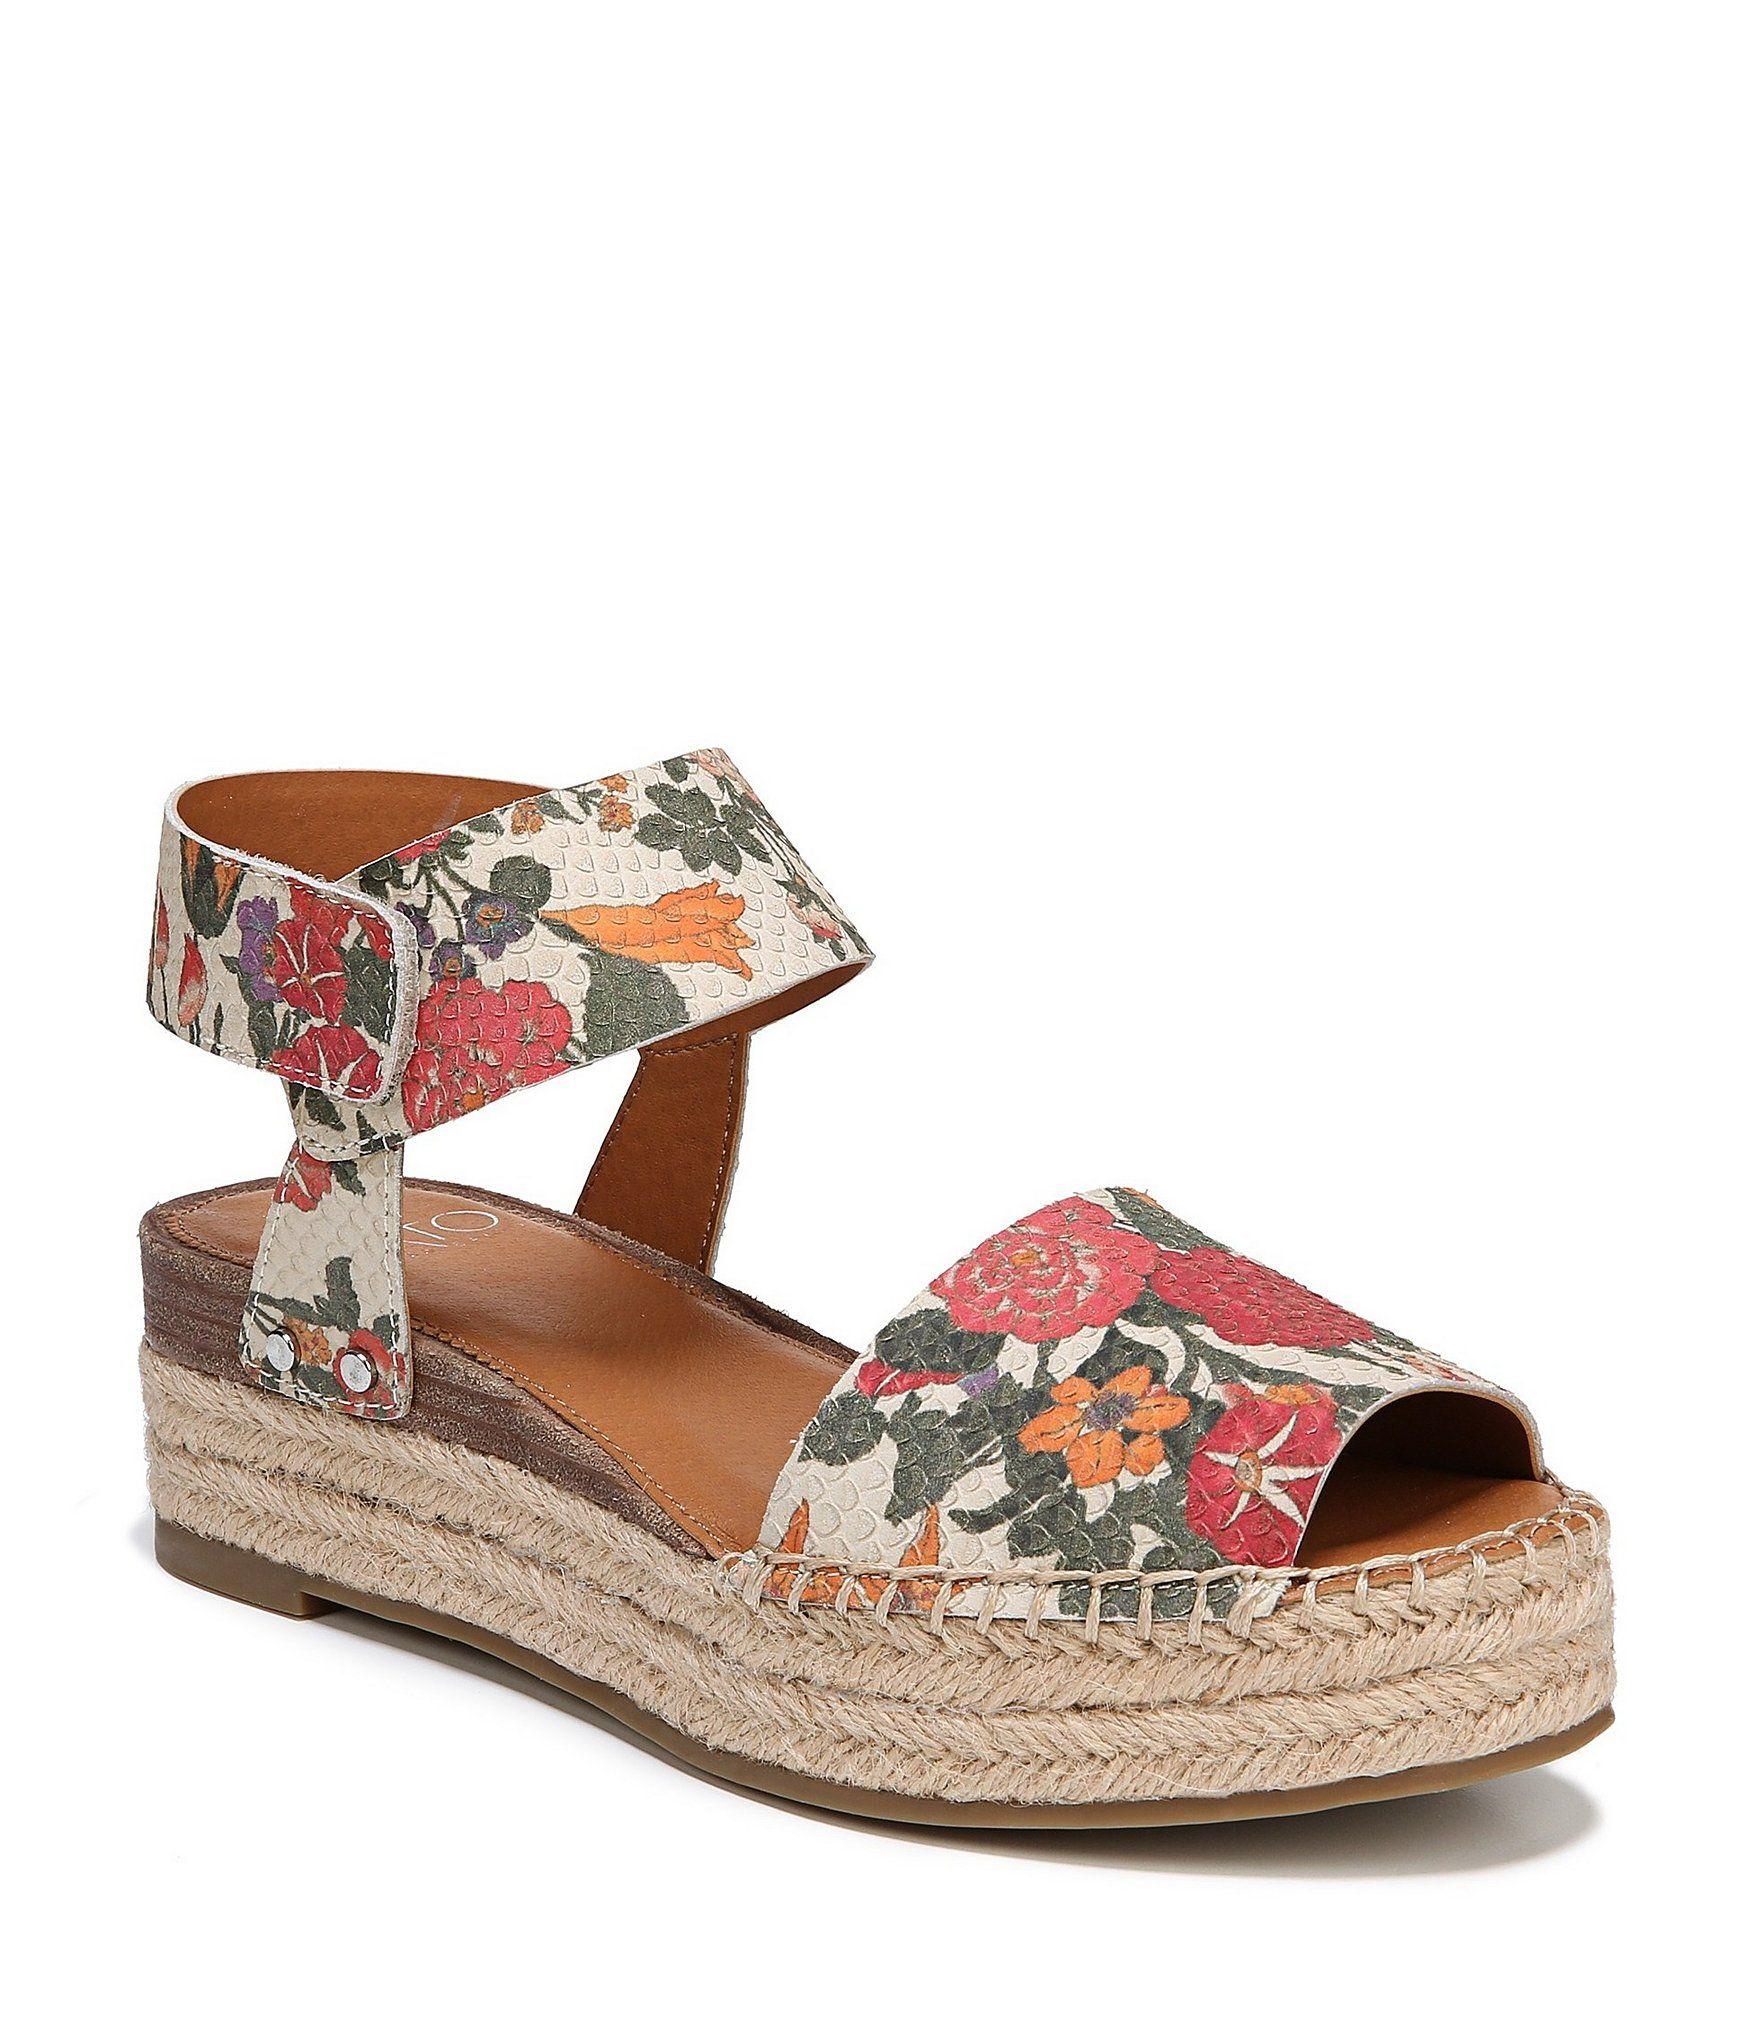 4dcfea256759e9 Sarto by Franco Sarto Oak Blossom Snake Embossed Ankle Strap Espadrille  Sandals  Dillards